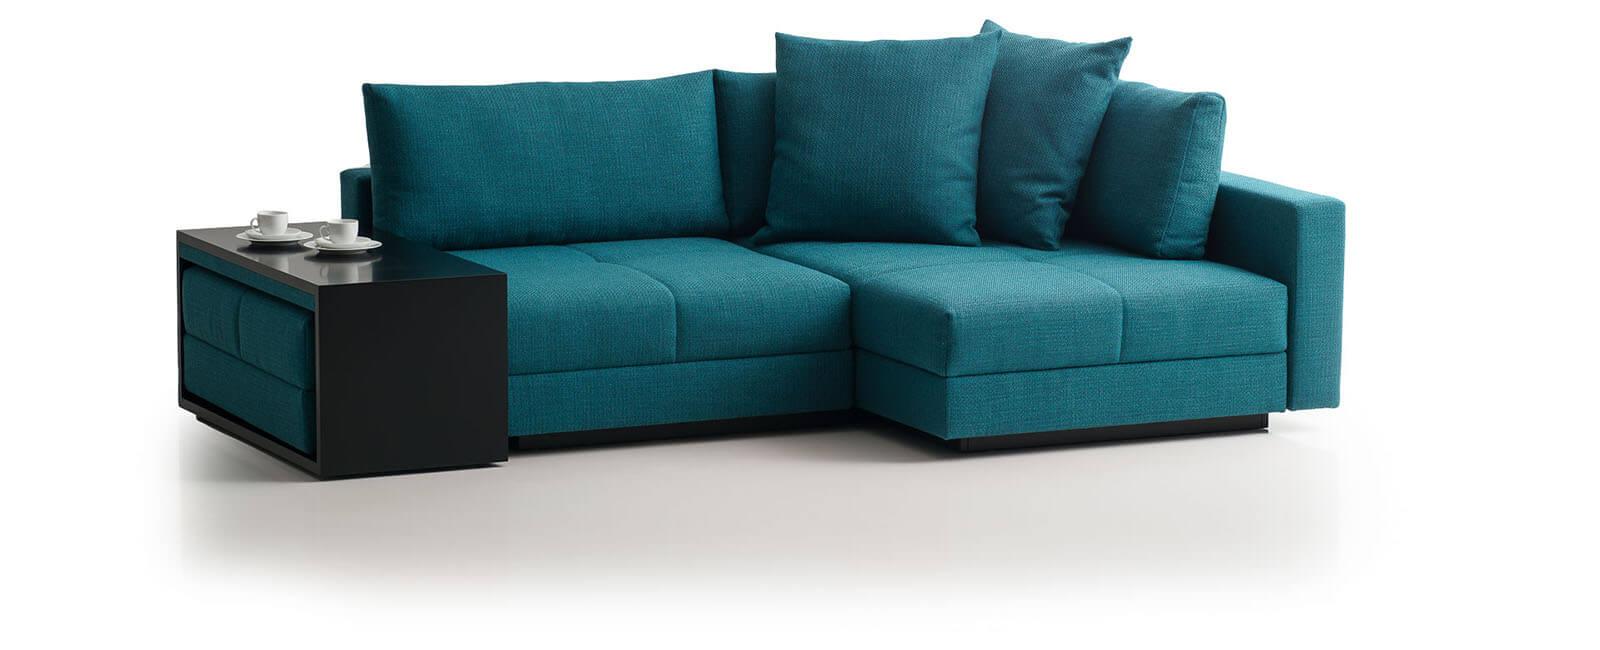 cocco sectional sofa bed. Black Bedroom Furniture Sets. Home Design Ideas